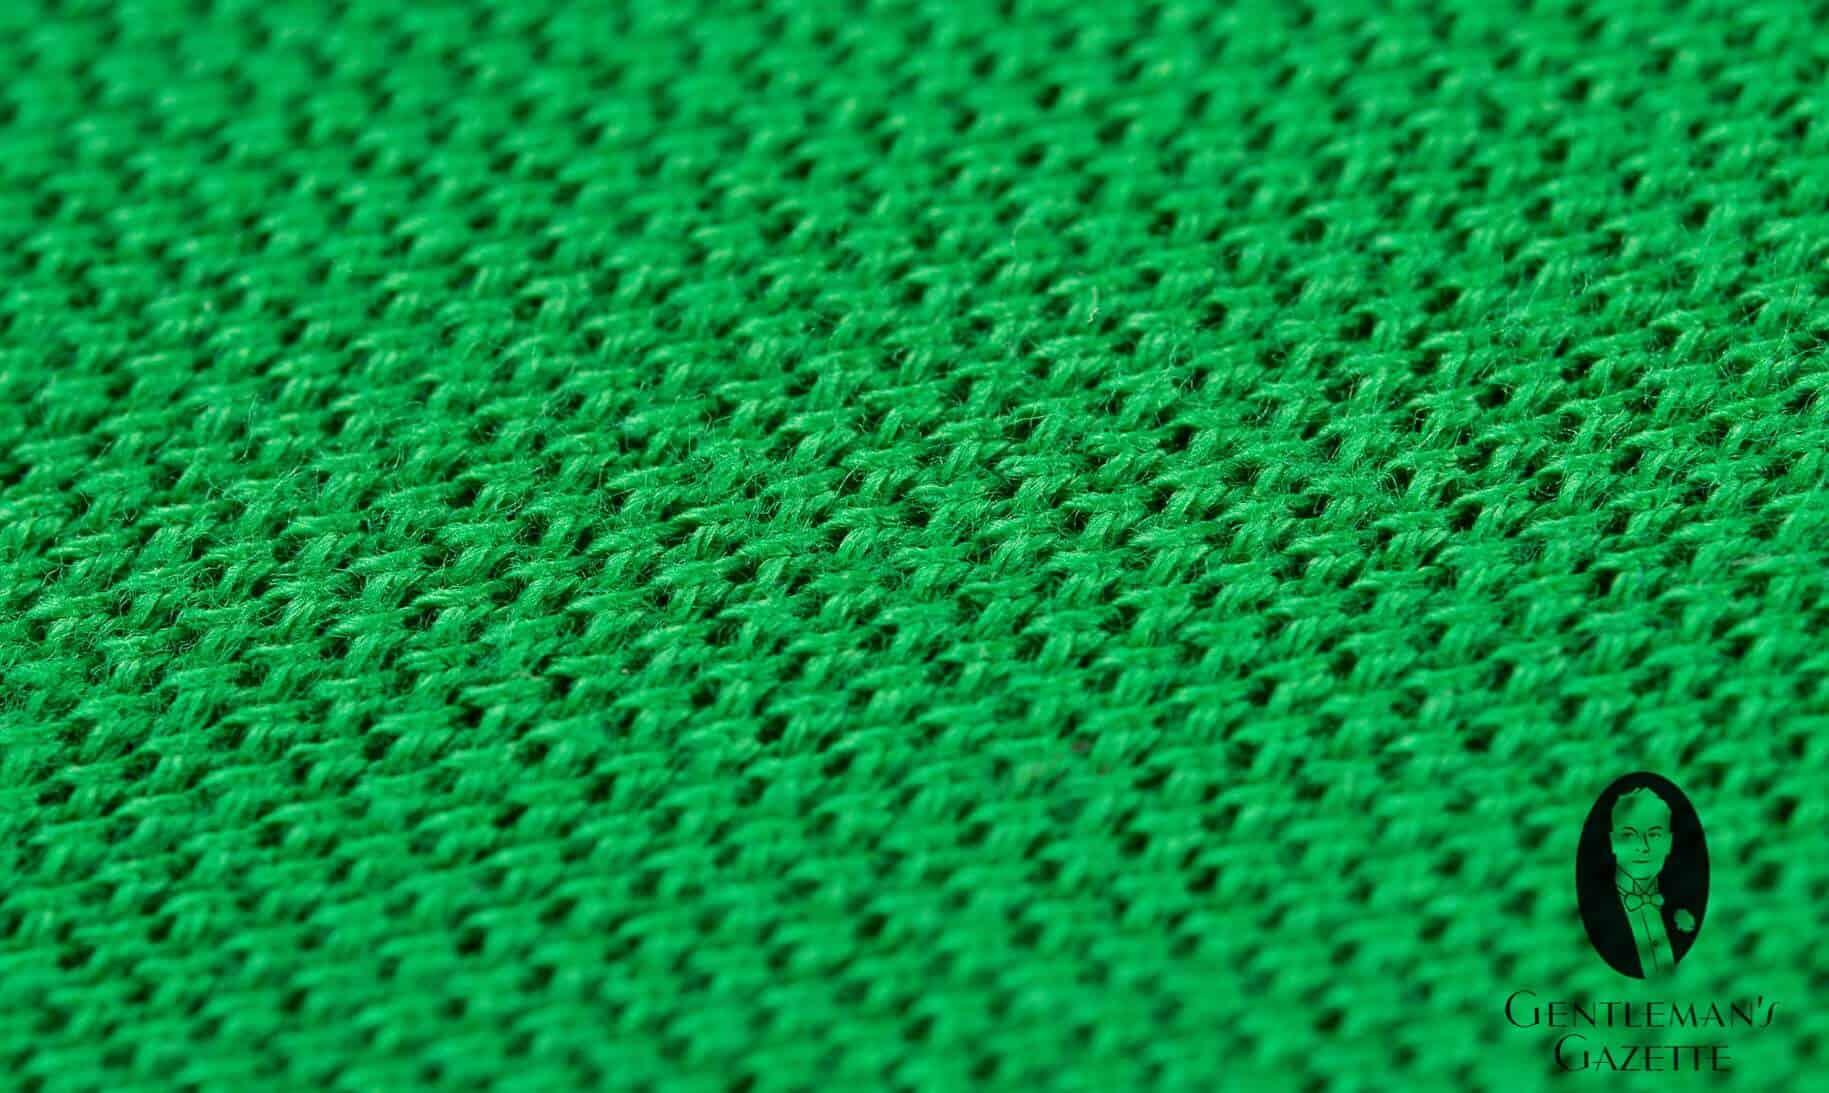 The Ultimate Polo Shirt Guide Gentlemans Gazette Tendencies Tshirt Legend Led Turquoise S All Cotton Pique Knit Mesh